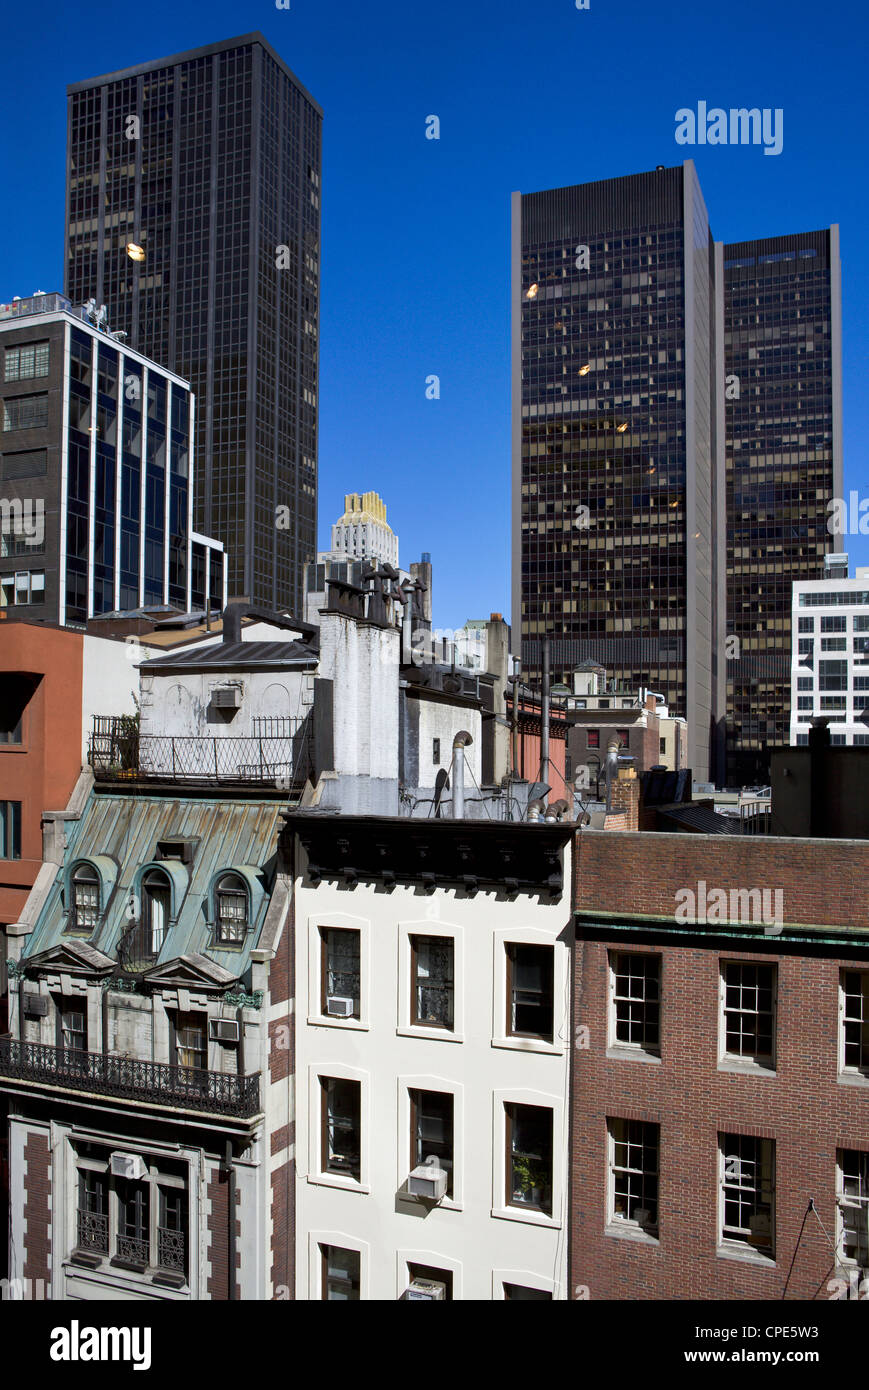 diverse architectural styles in manhattan new york city new york